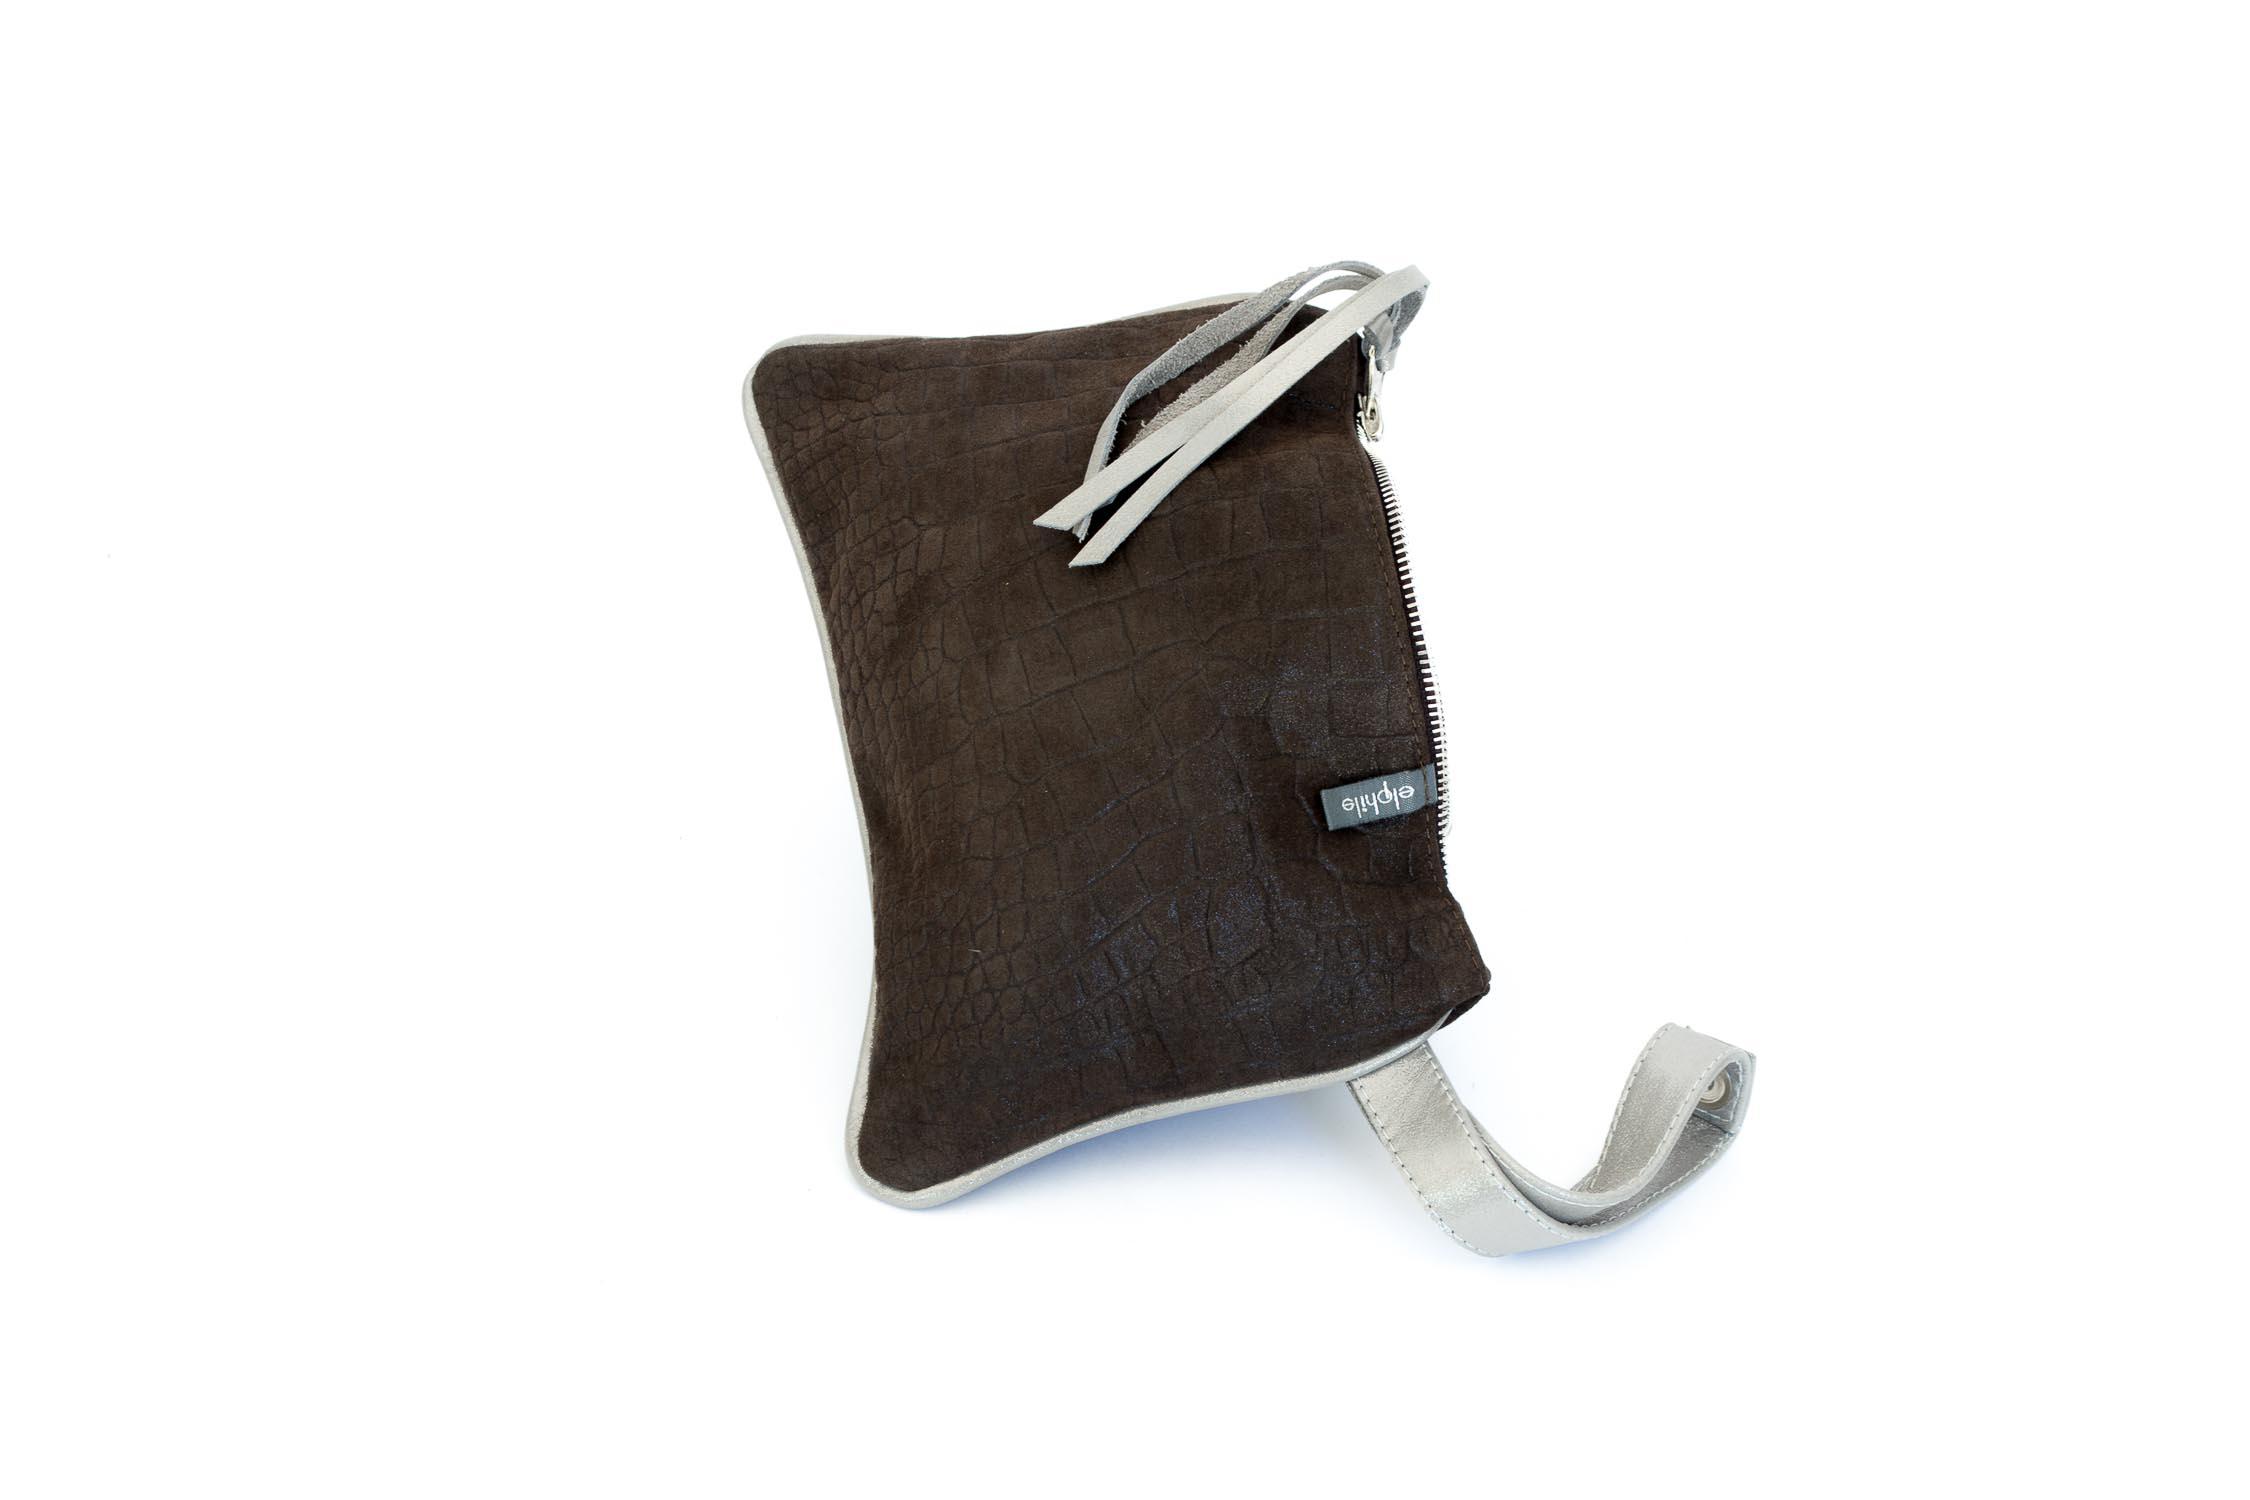 dark chocolate croco effect small clutch with silver strap